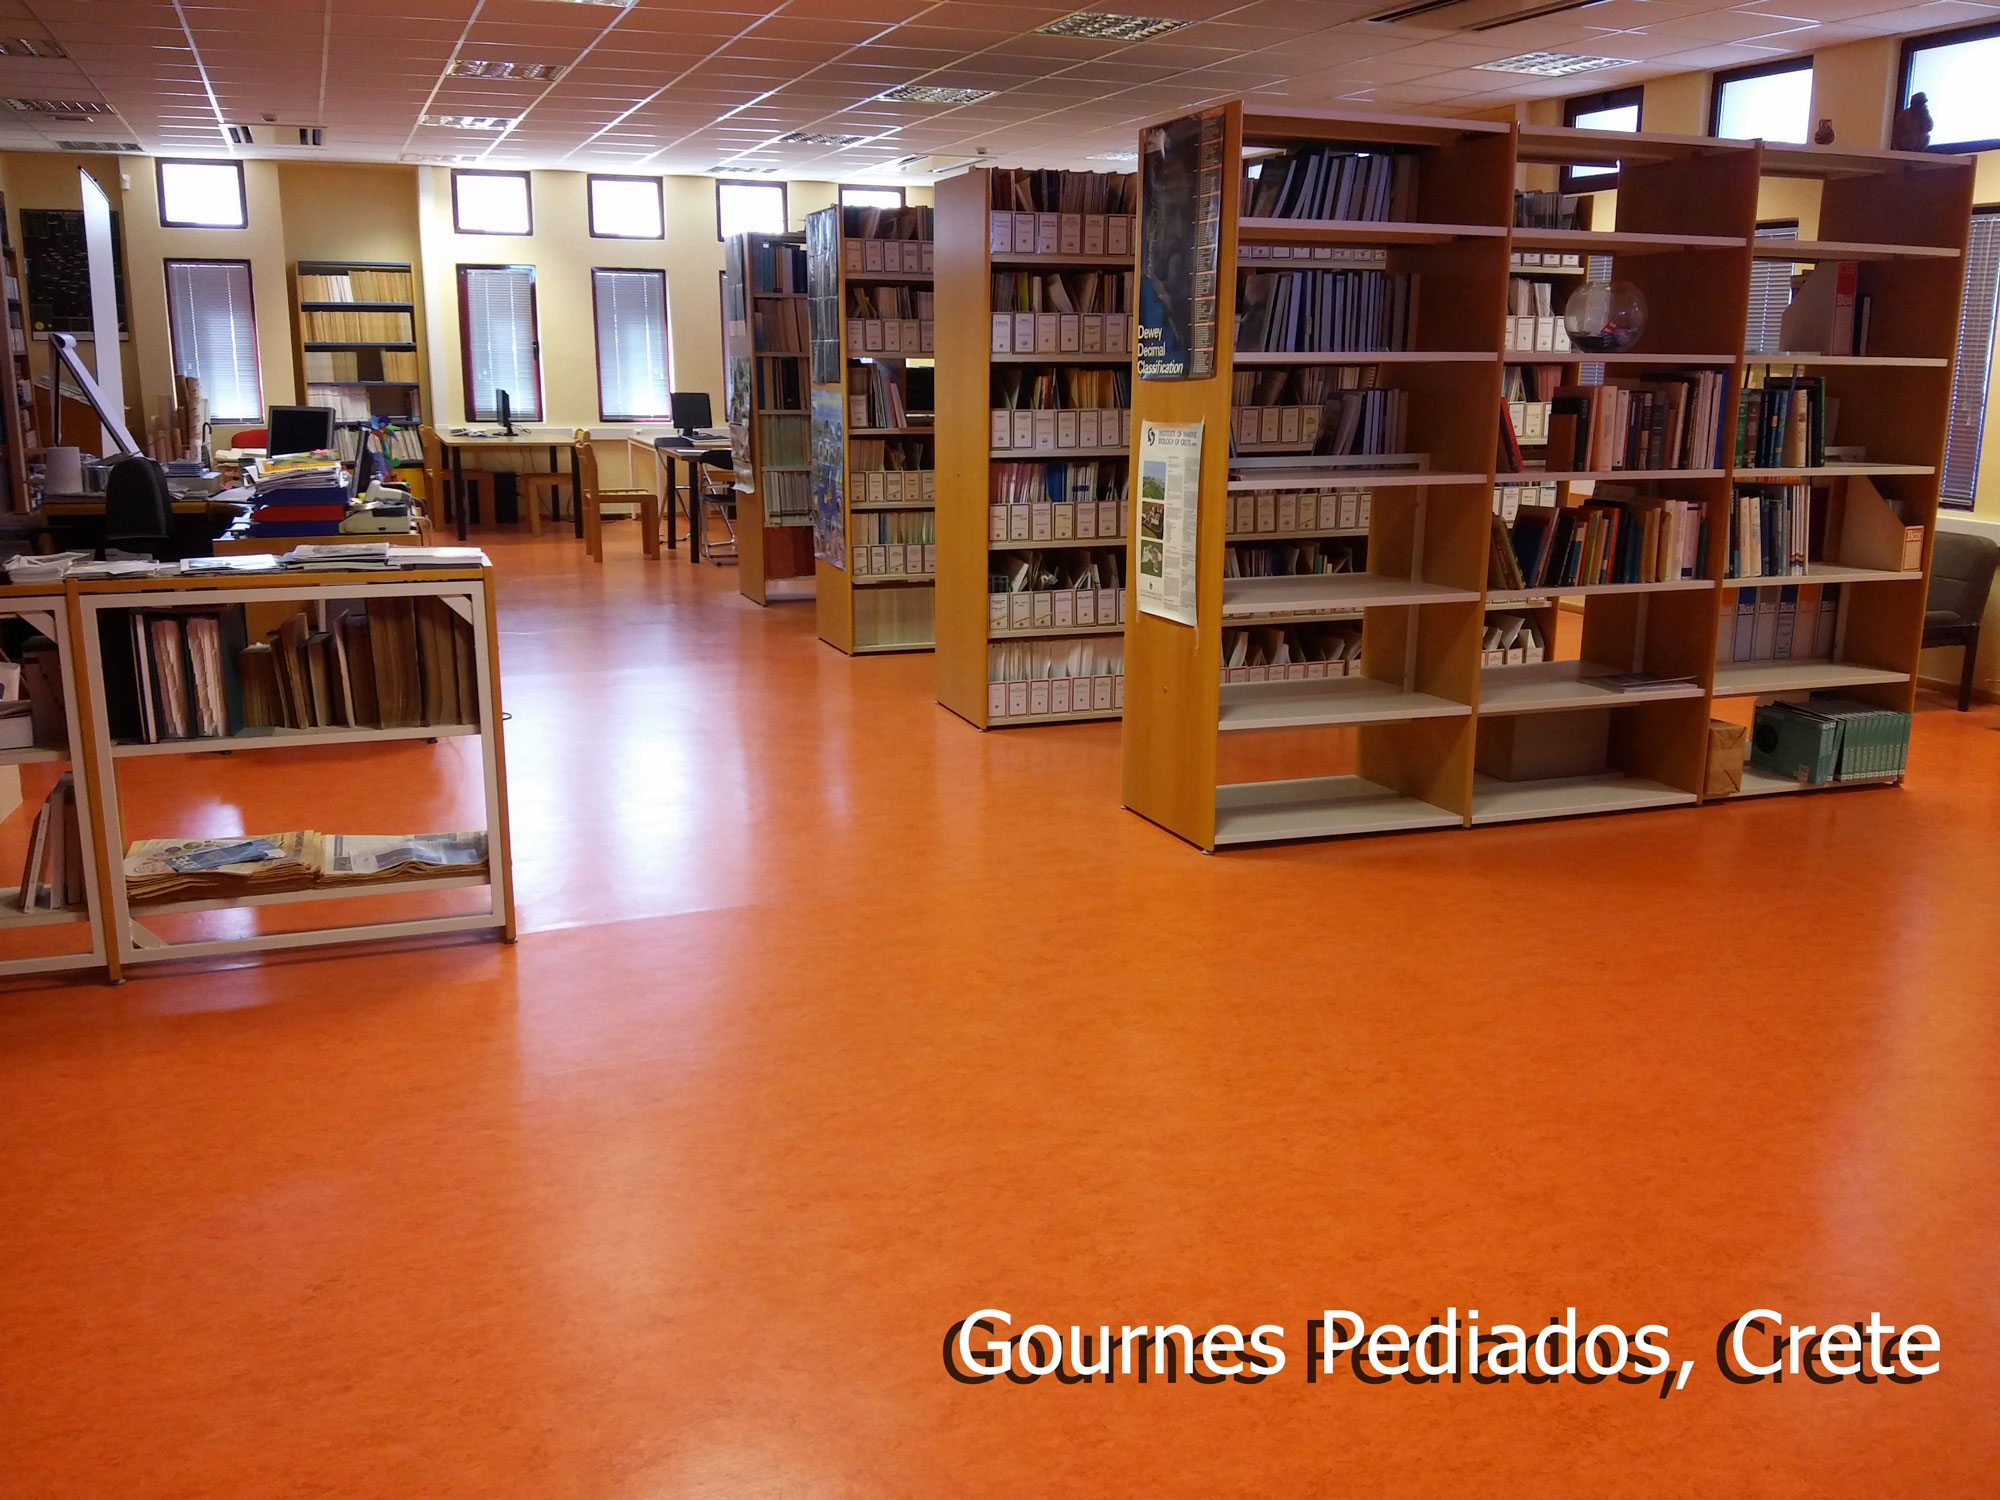 libraryCrete1